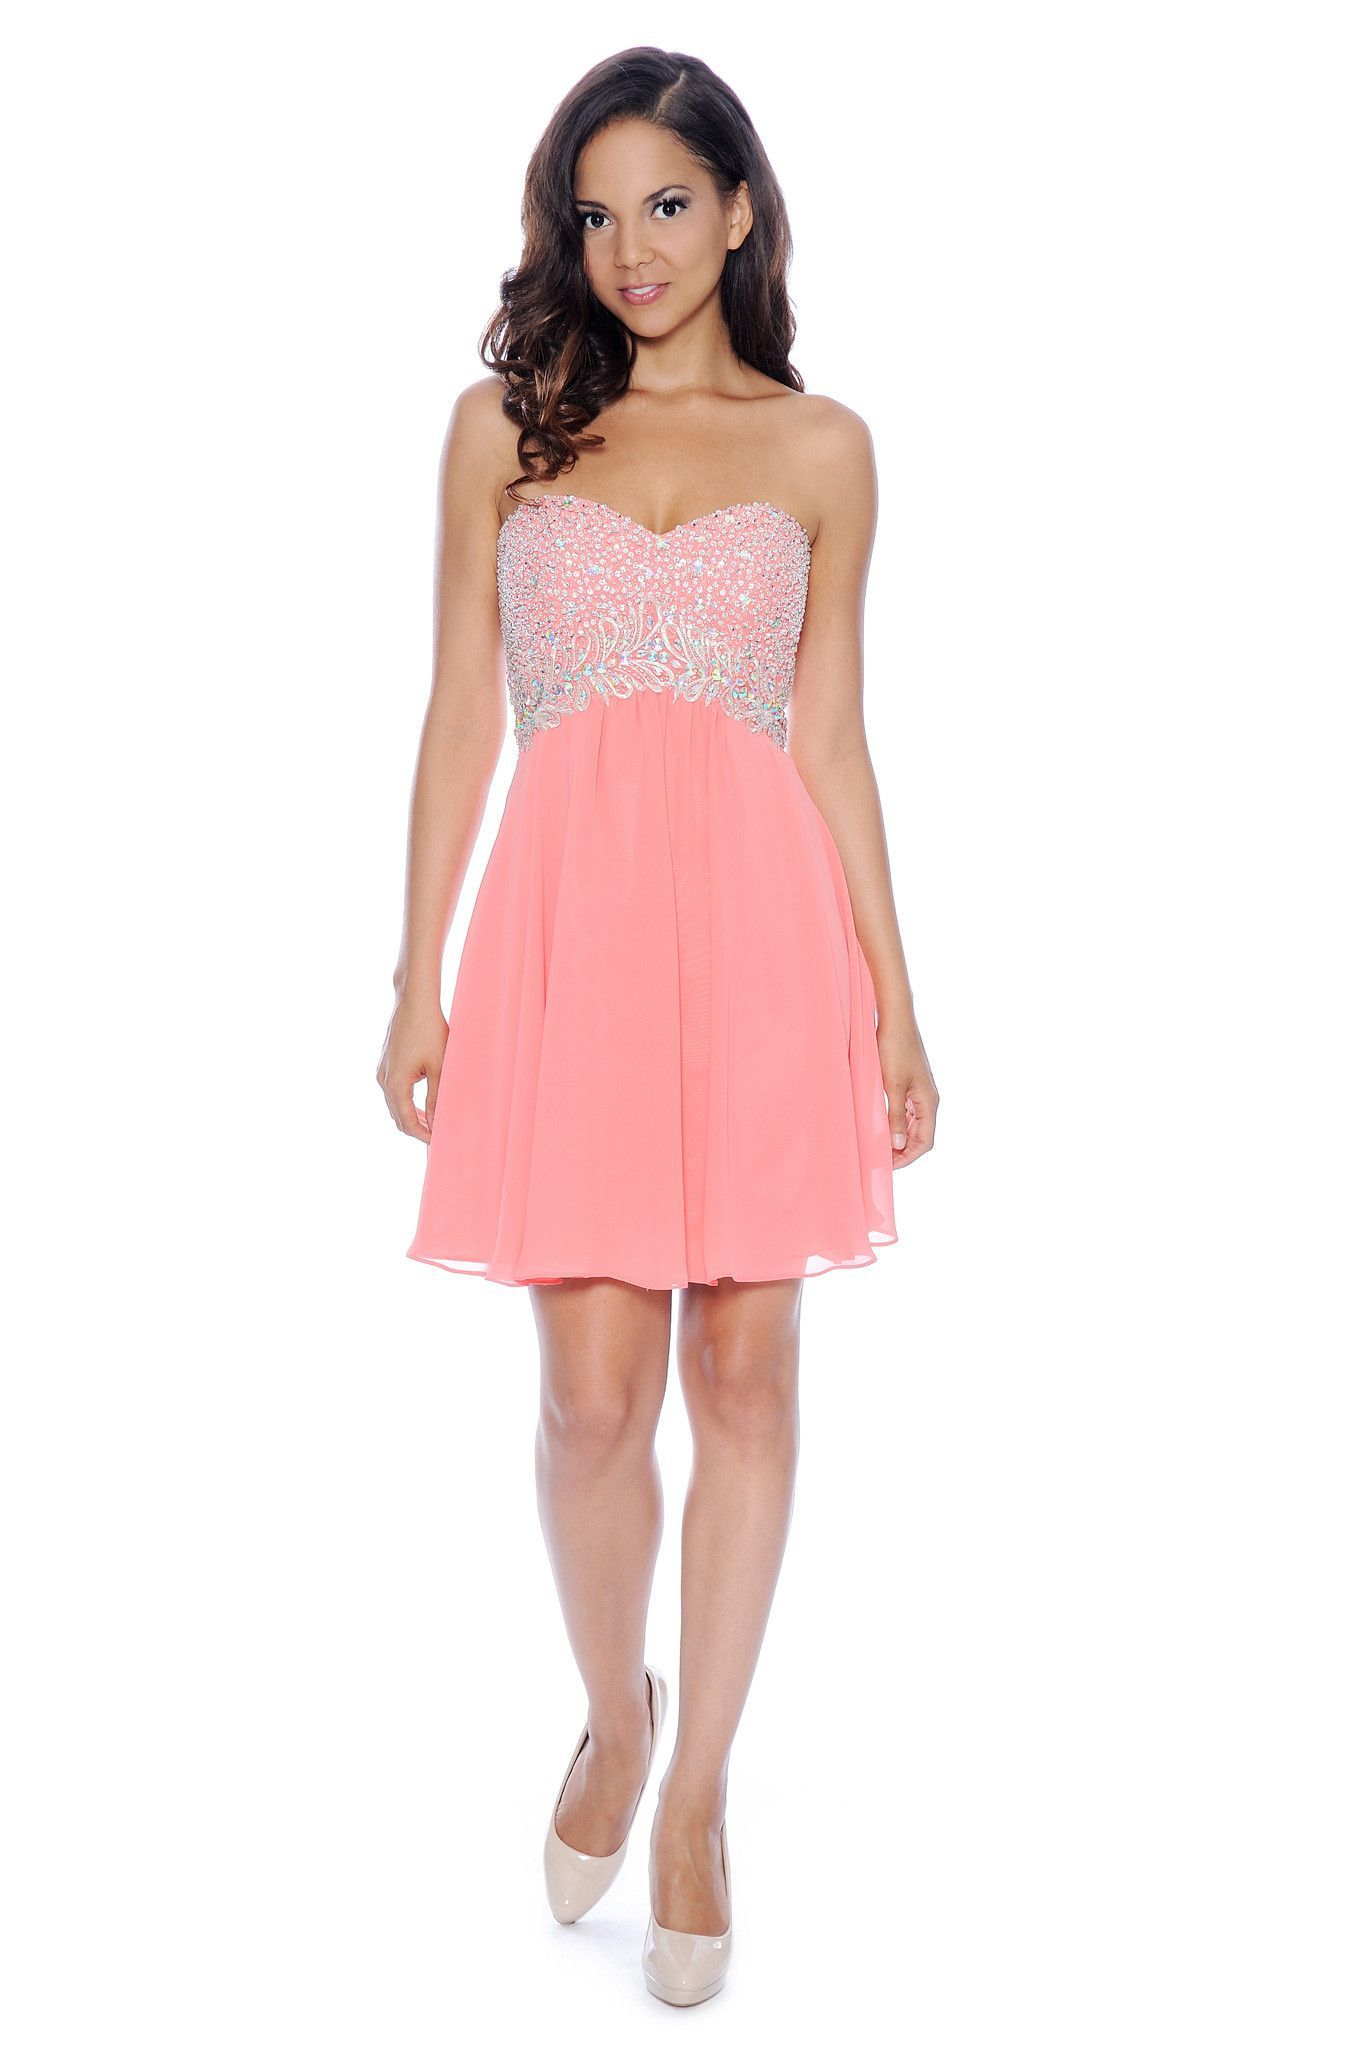 Sparkling Pink Corset Knee Length Dress - Coral | Pink | Pinterest